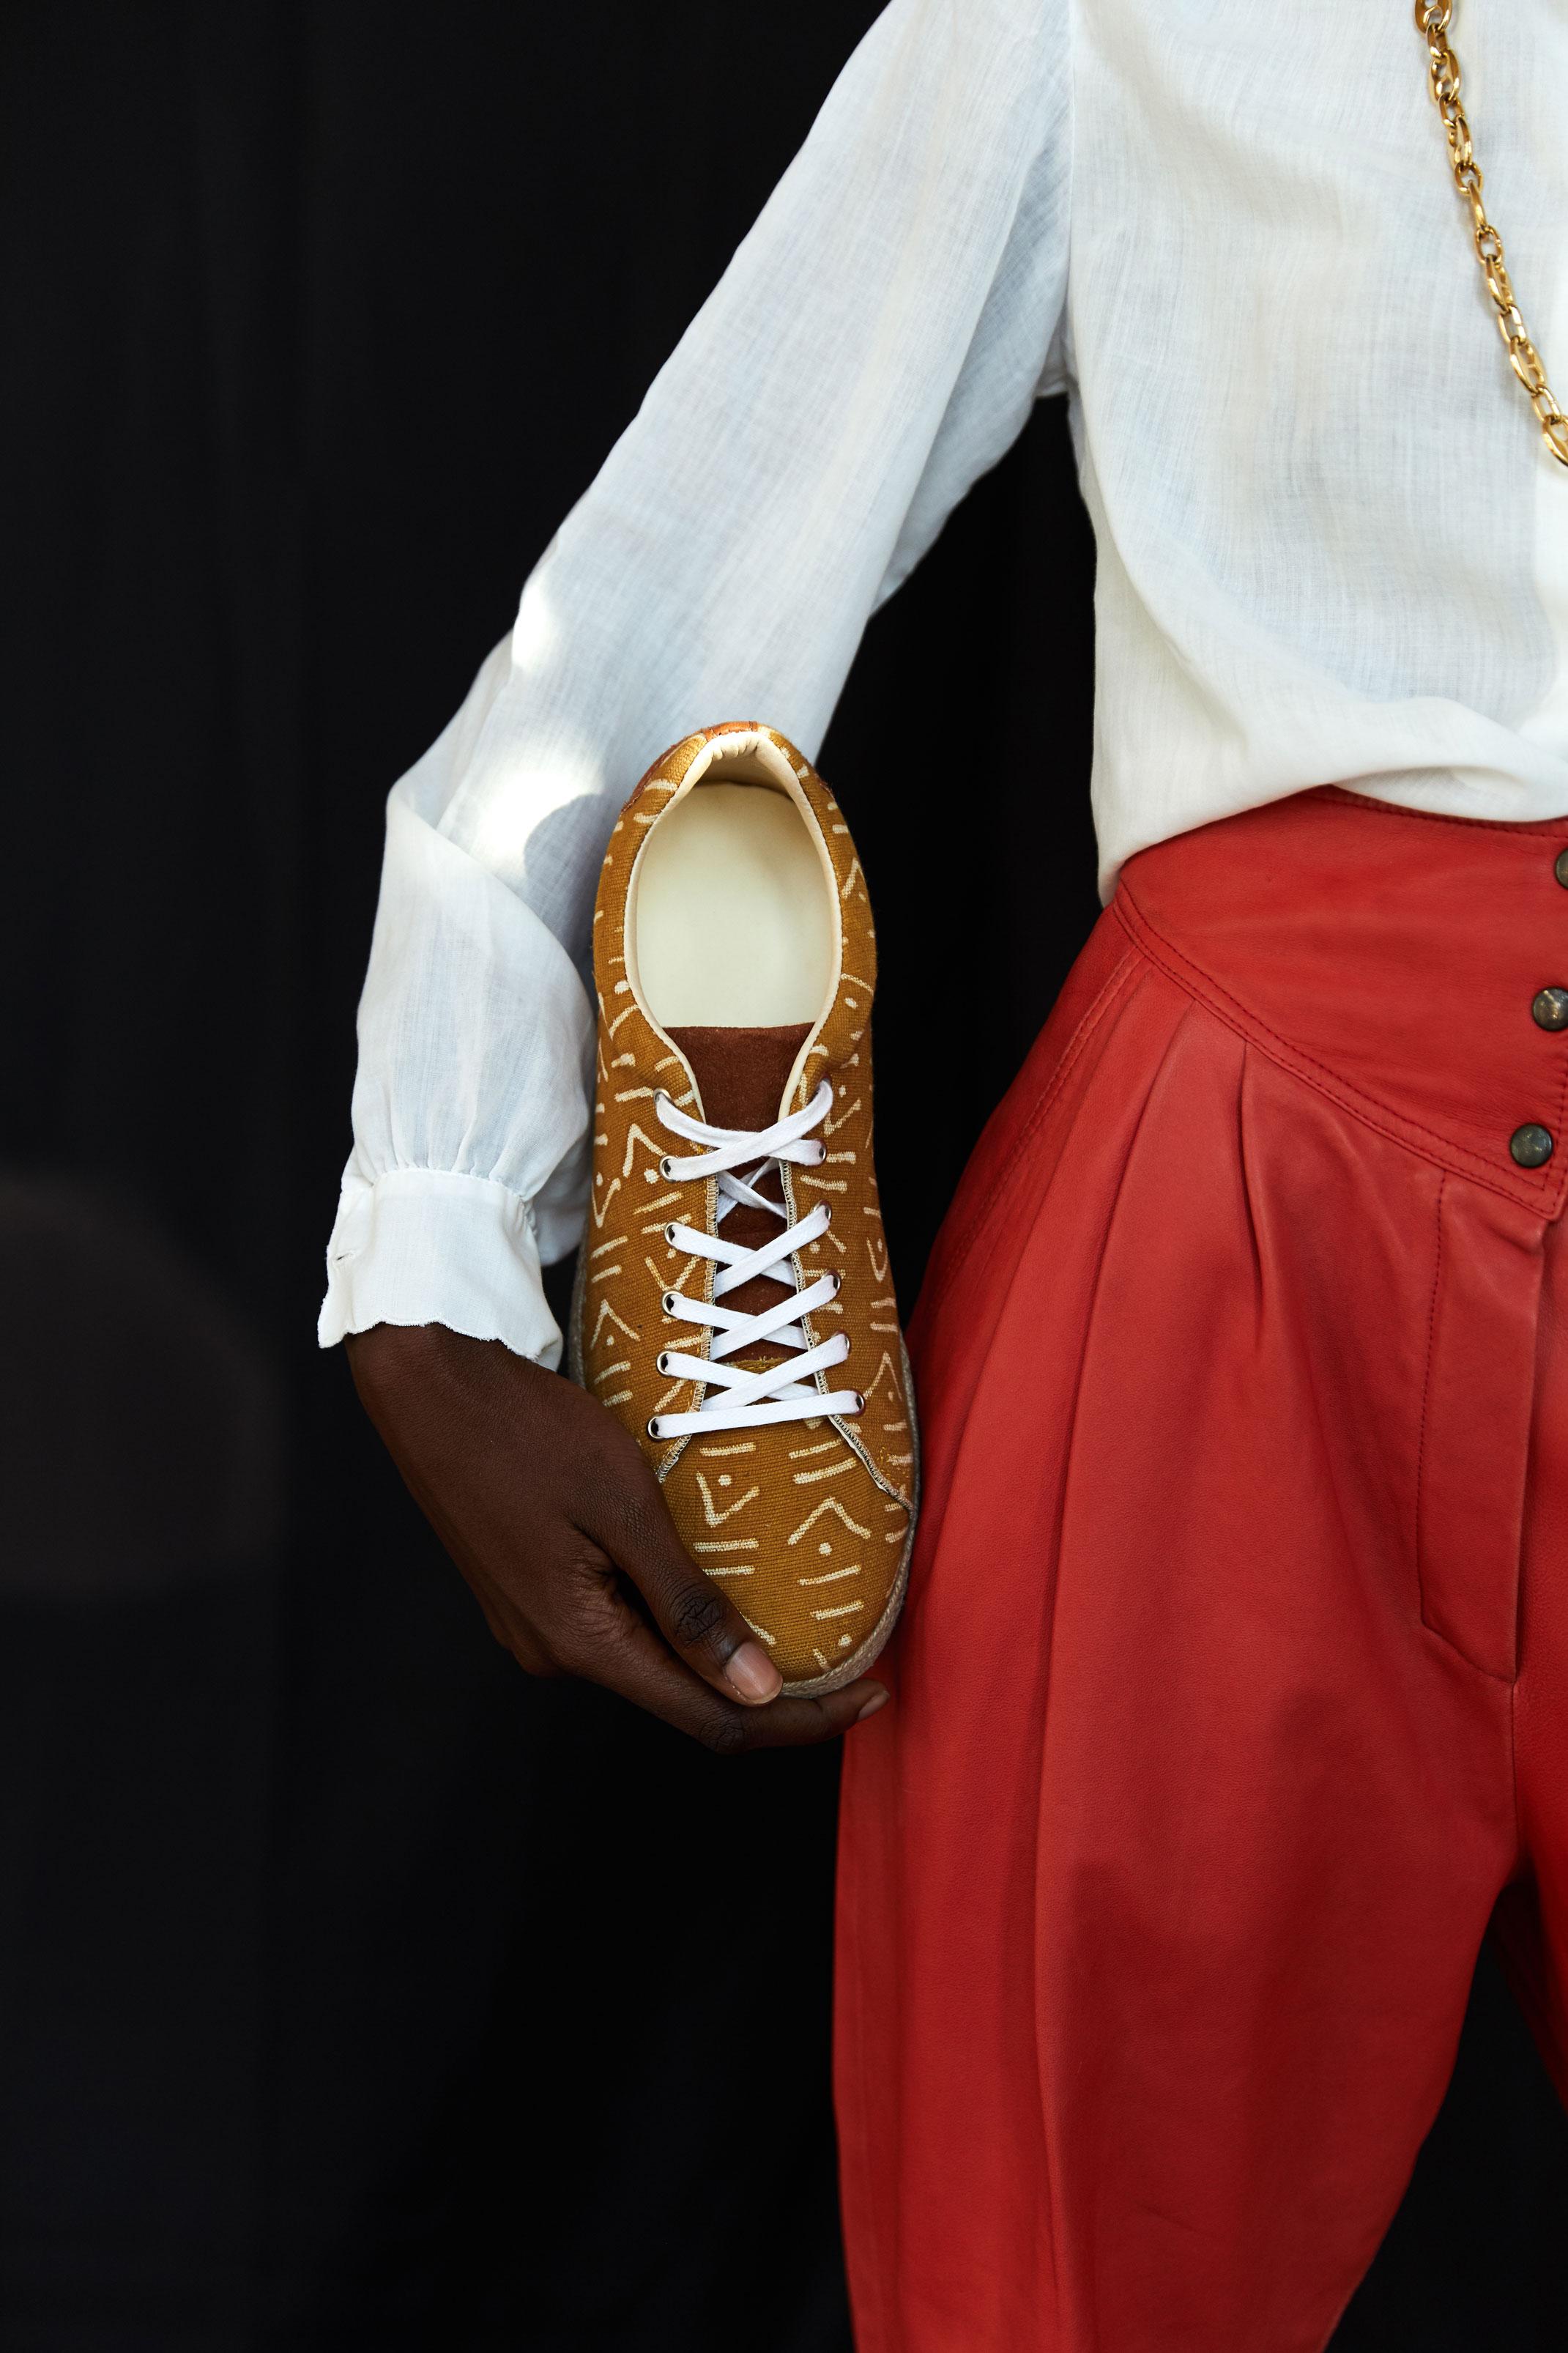 umoja chaussure eco responsable quimper